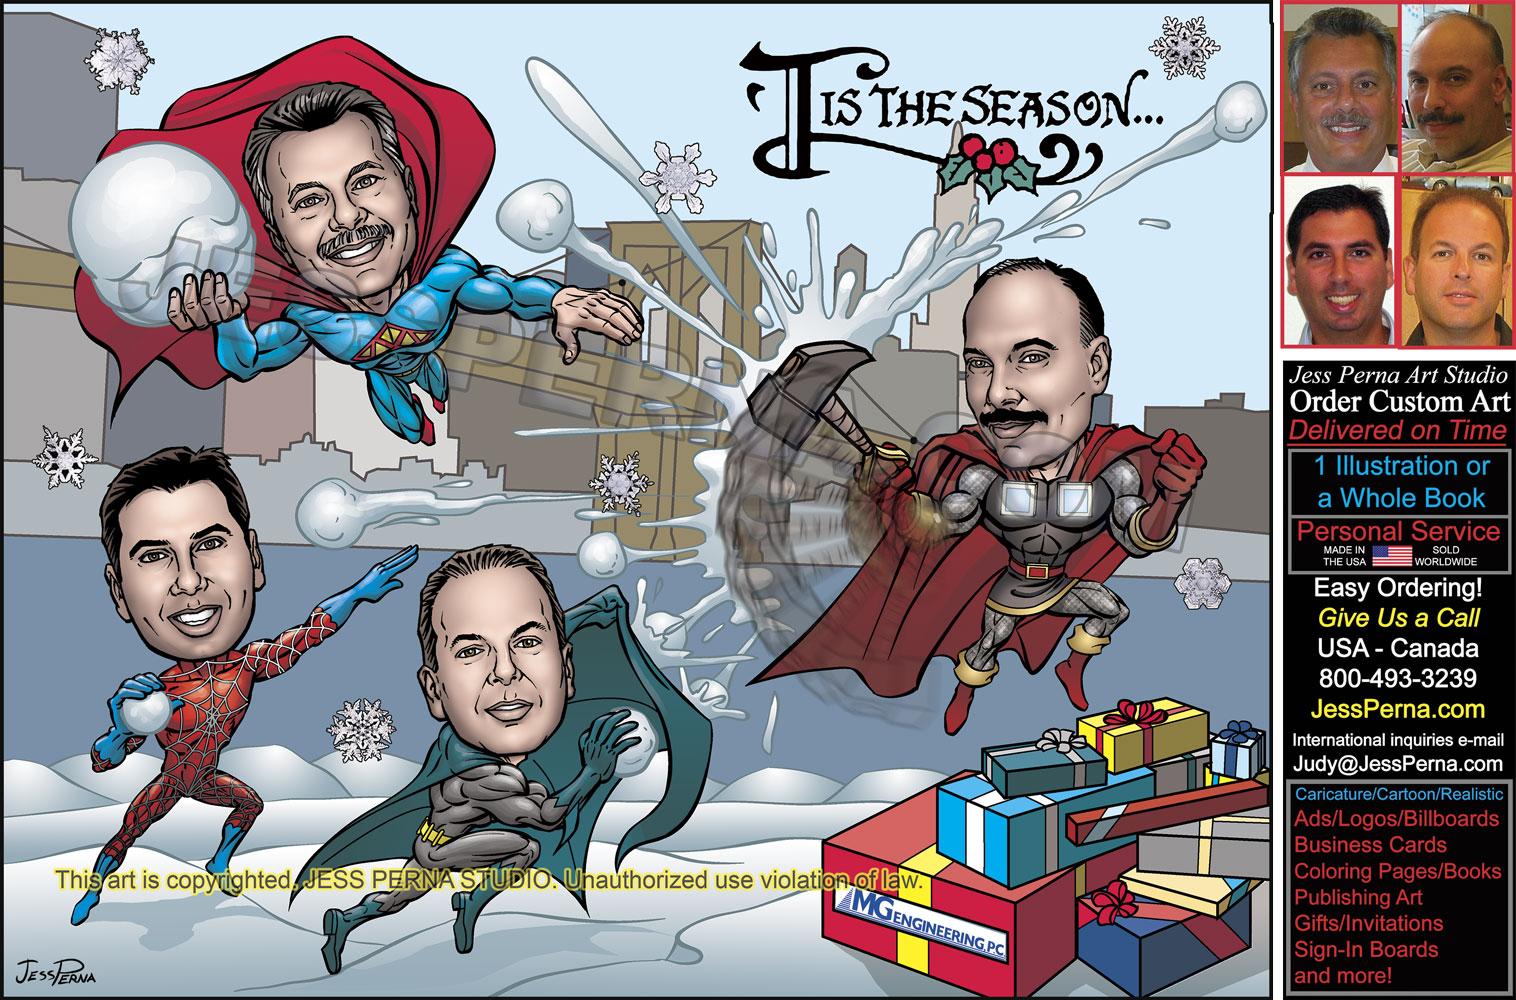 Caricature and Cartoon Portfolio Funny Cartoon Illustrations